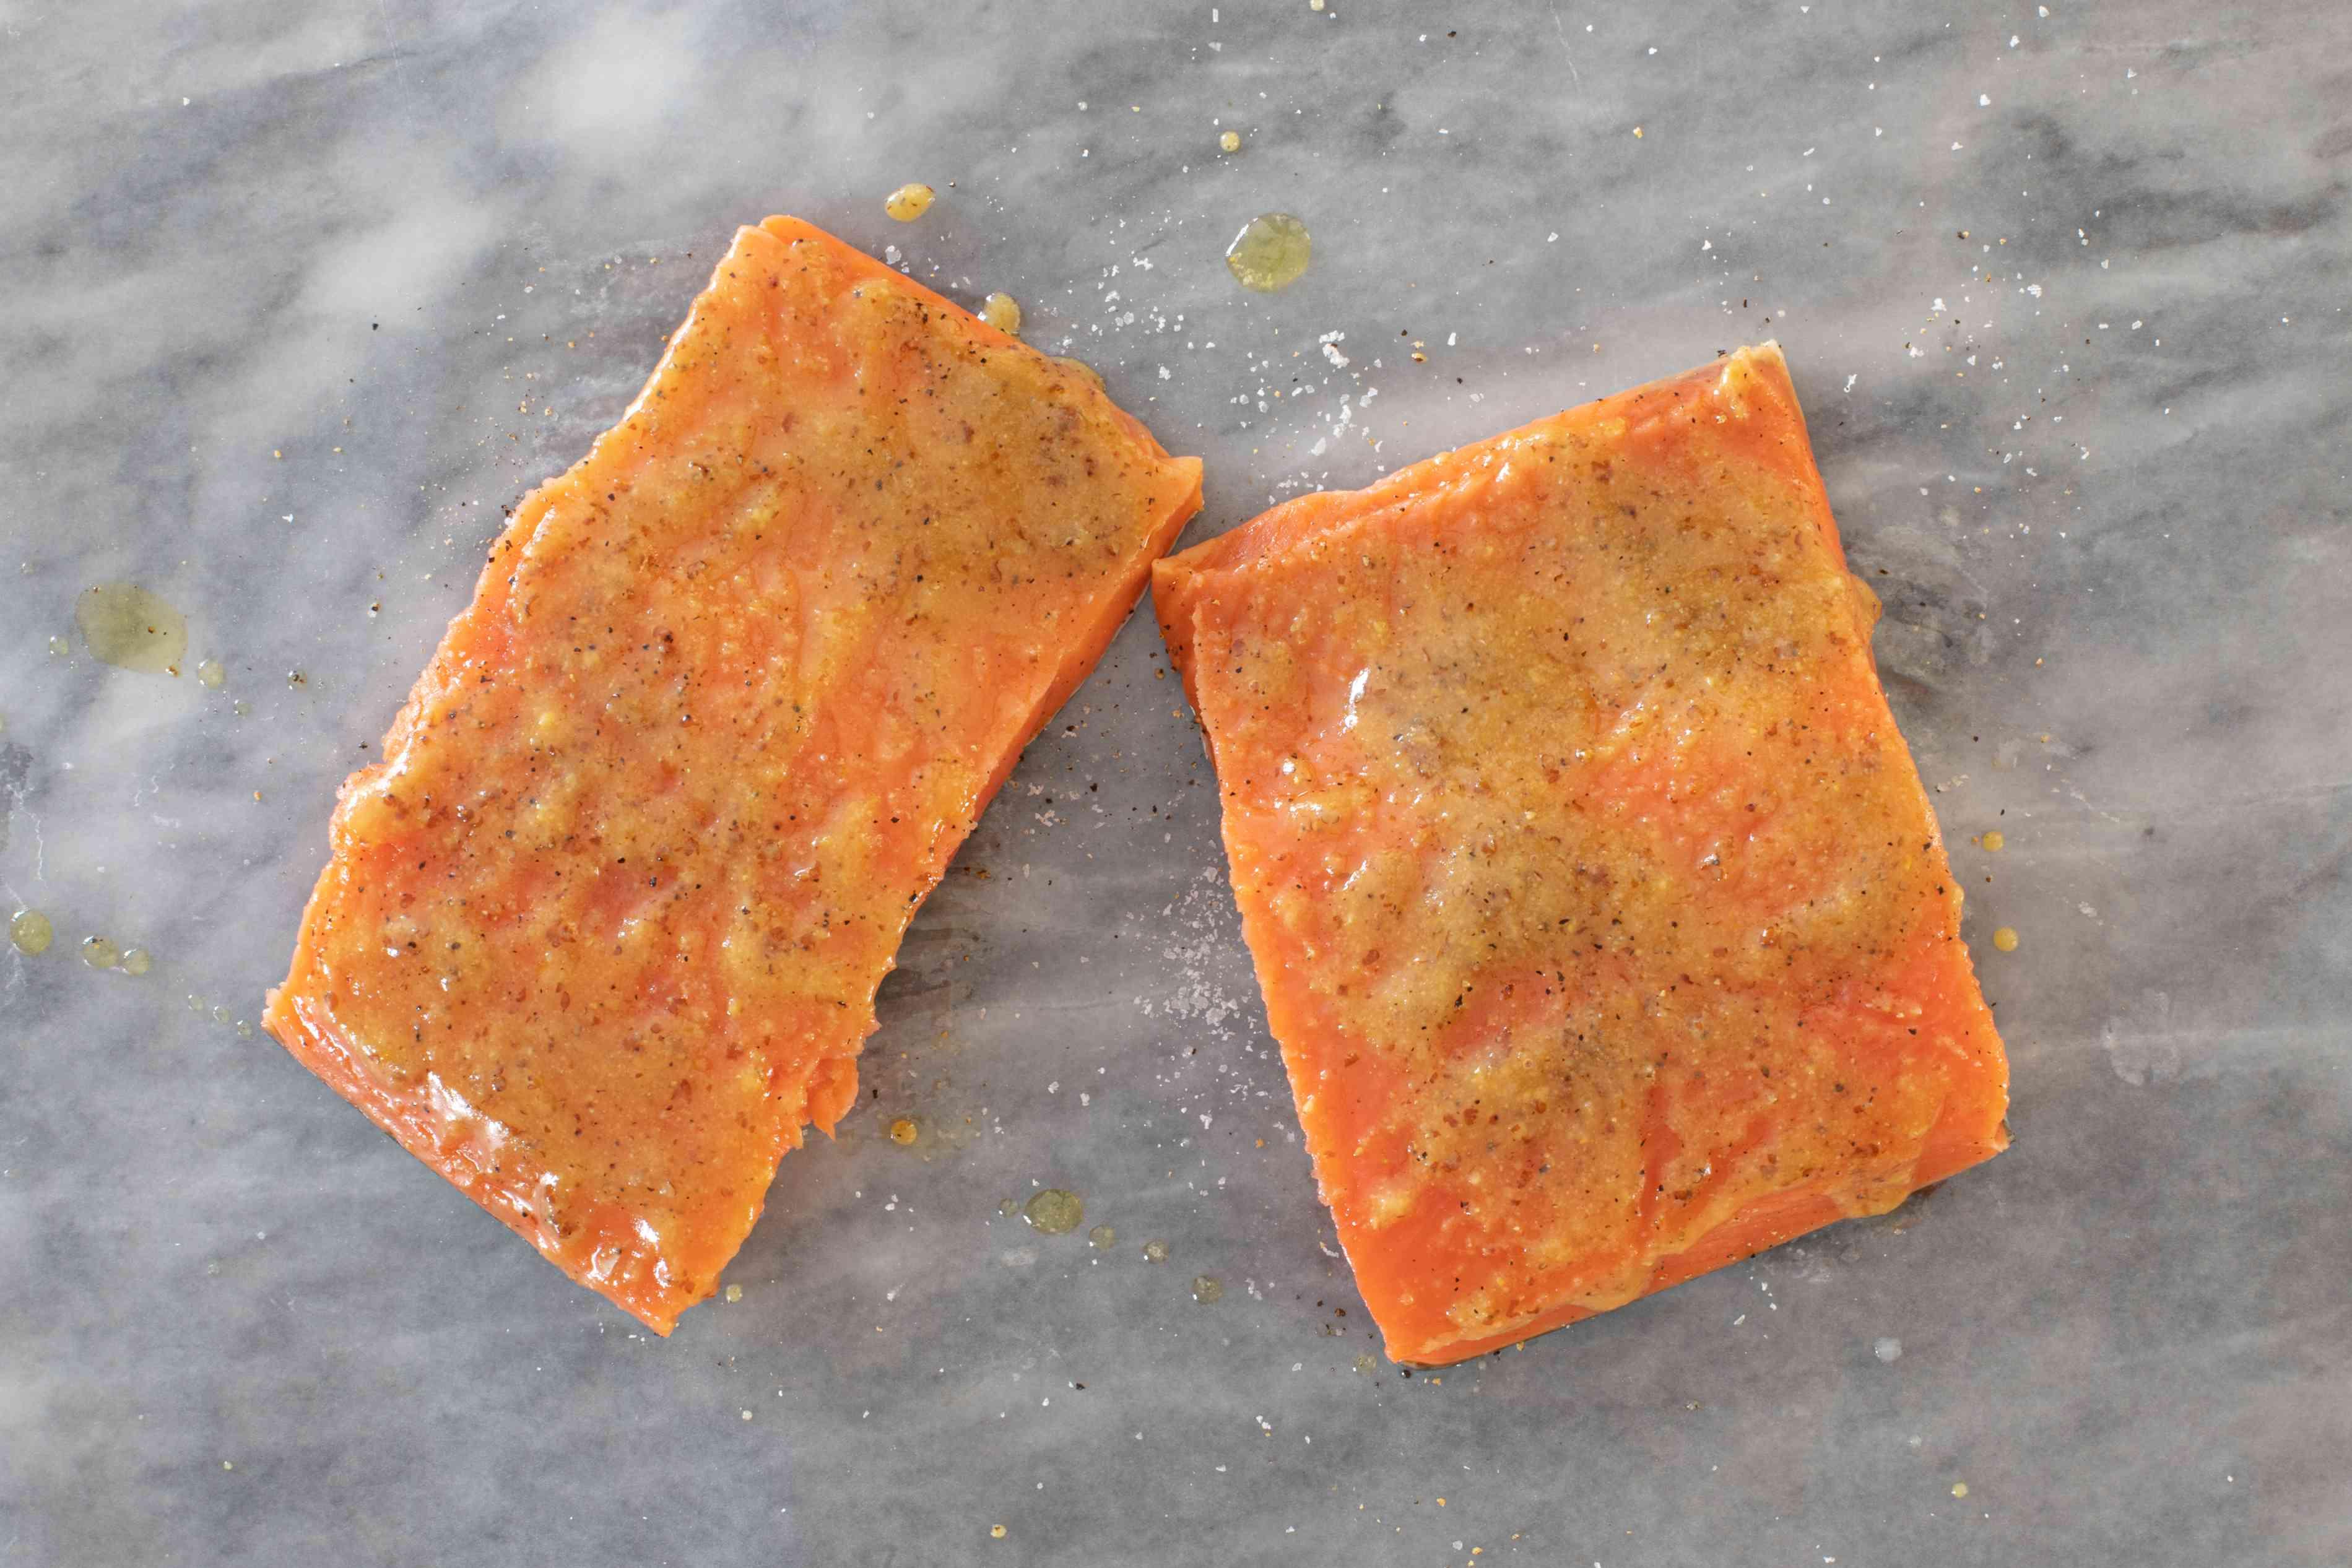 honey and mustard glaze on the salmon fillets